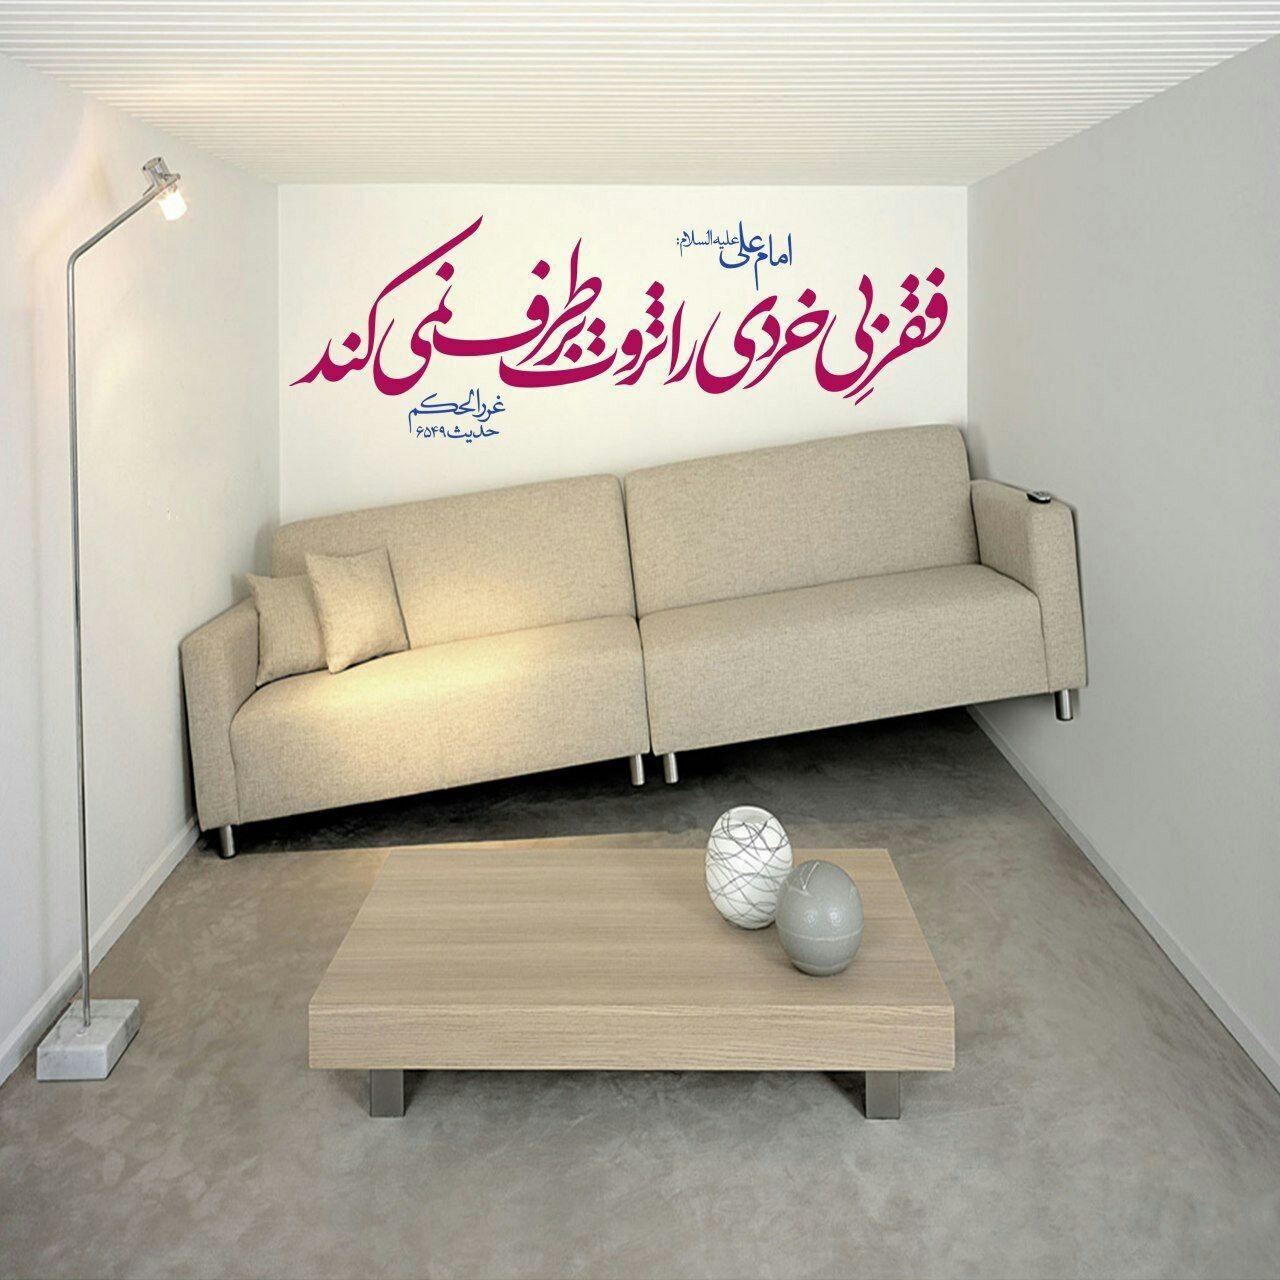 Pin By Ali Ali On Hadith Farsi Quotes Cool Words Farsi Poem